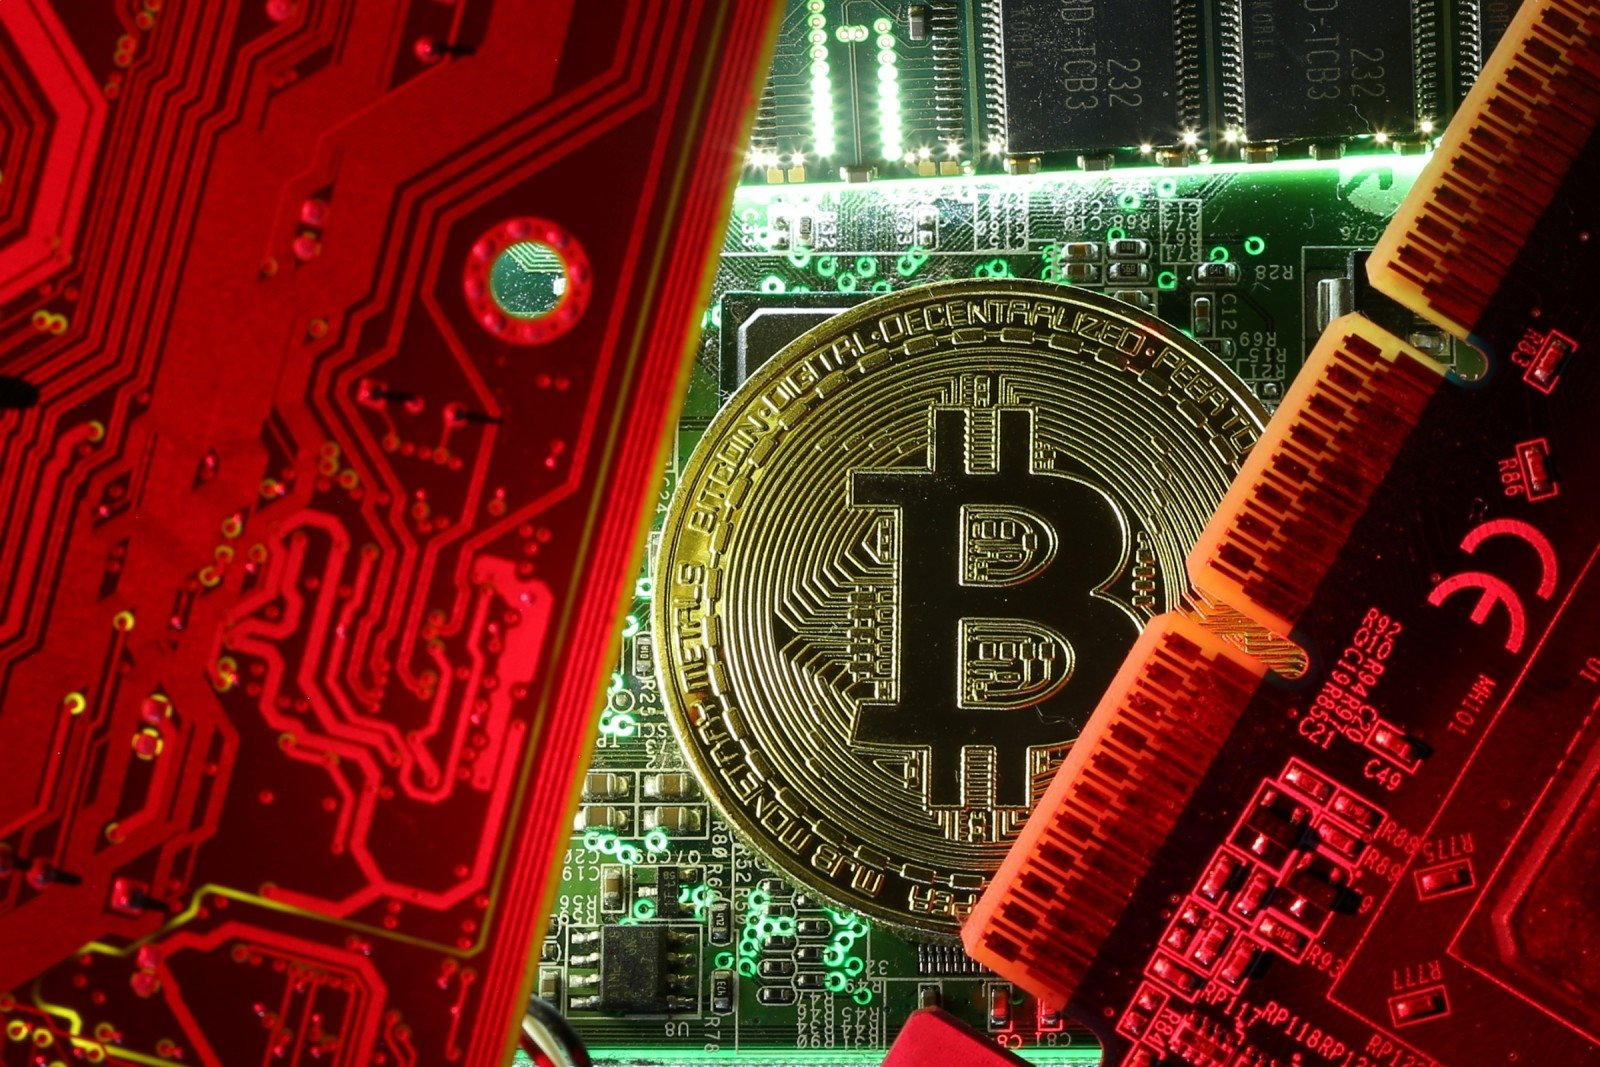 bitkoinų ekspertas